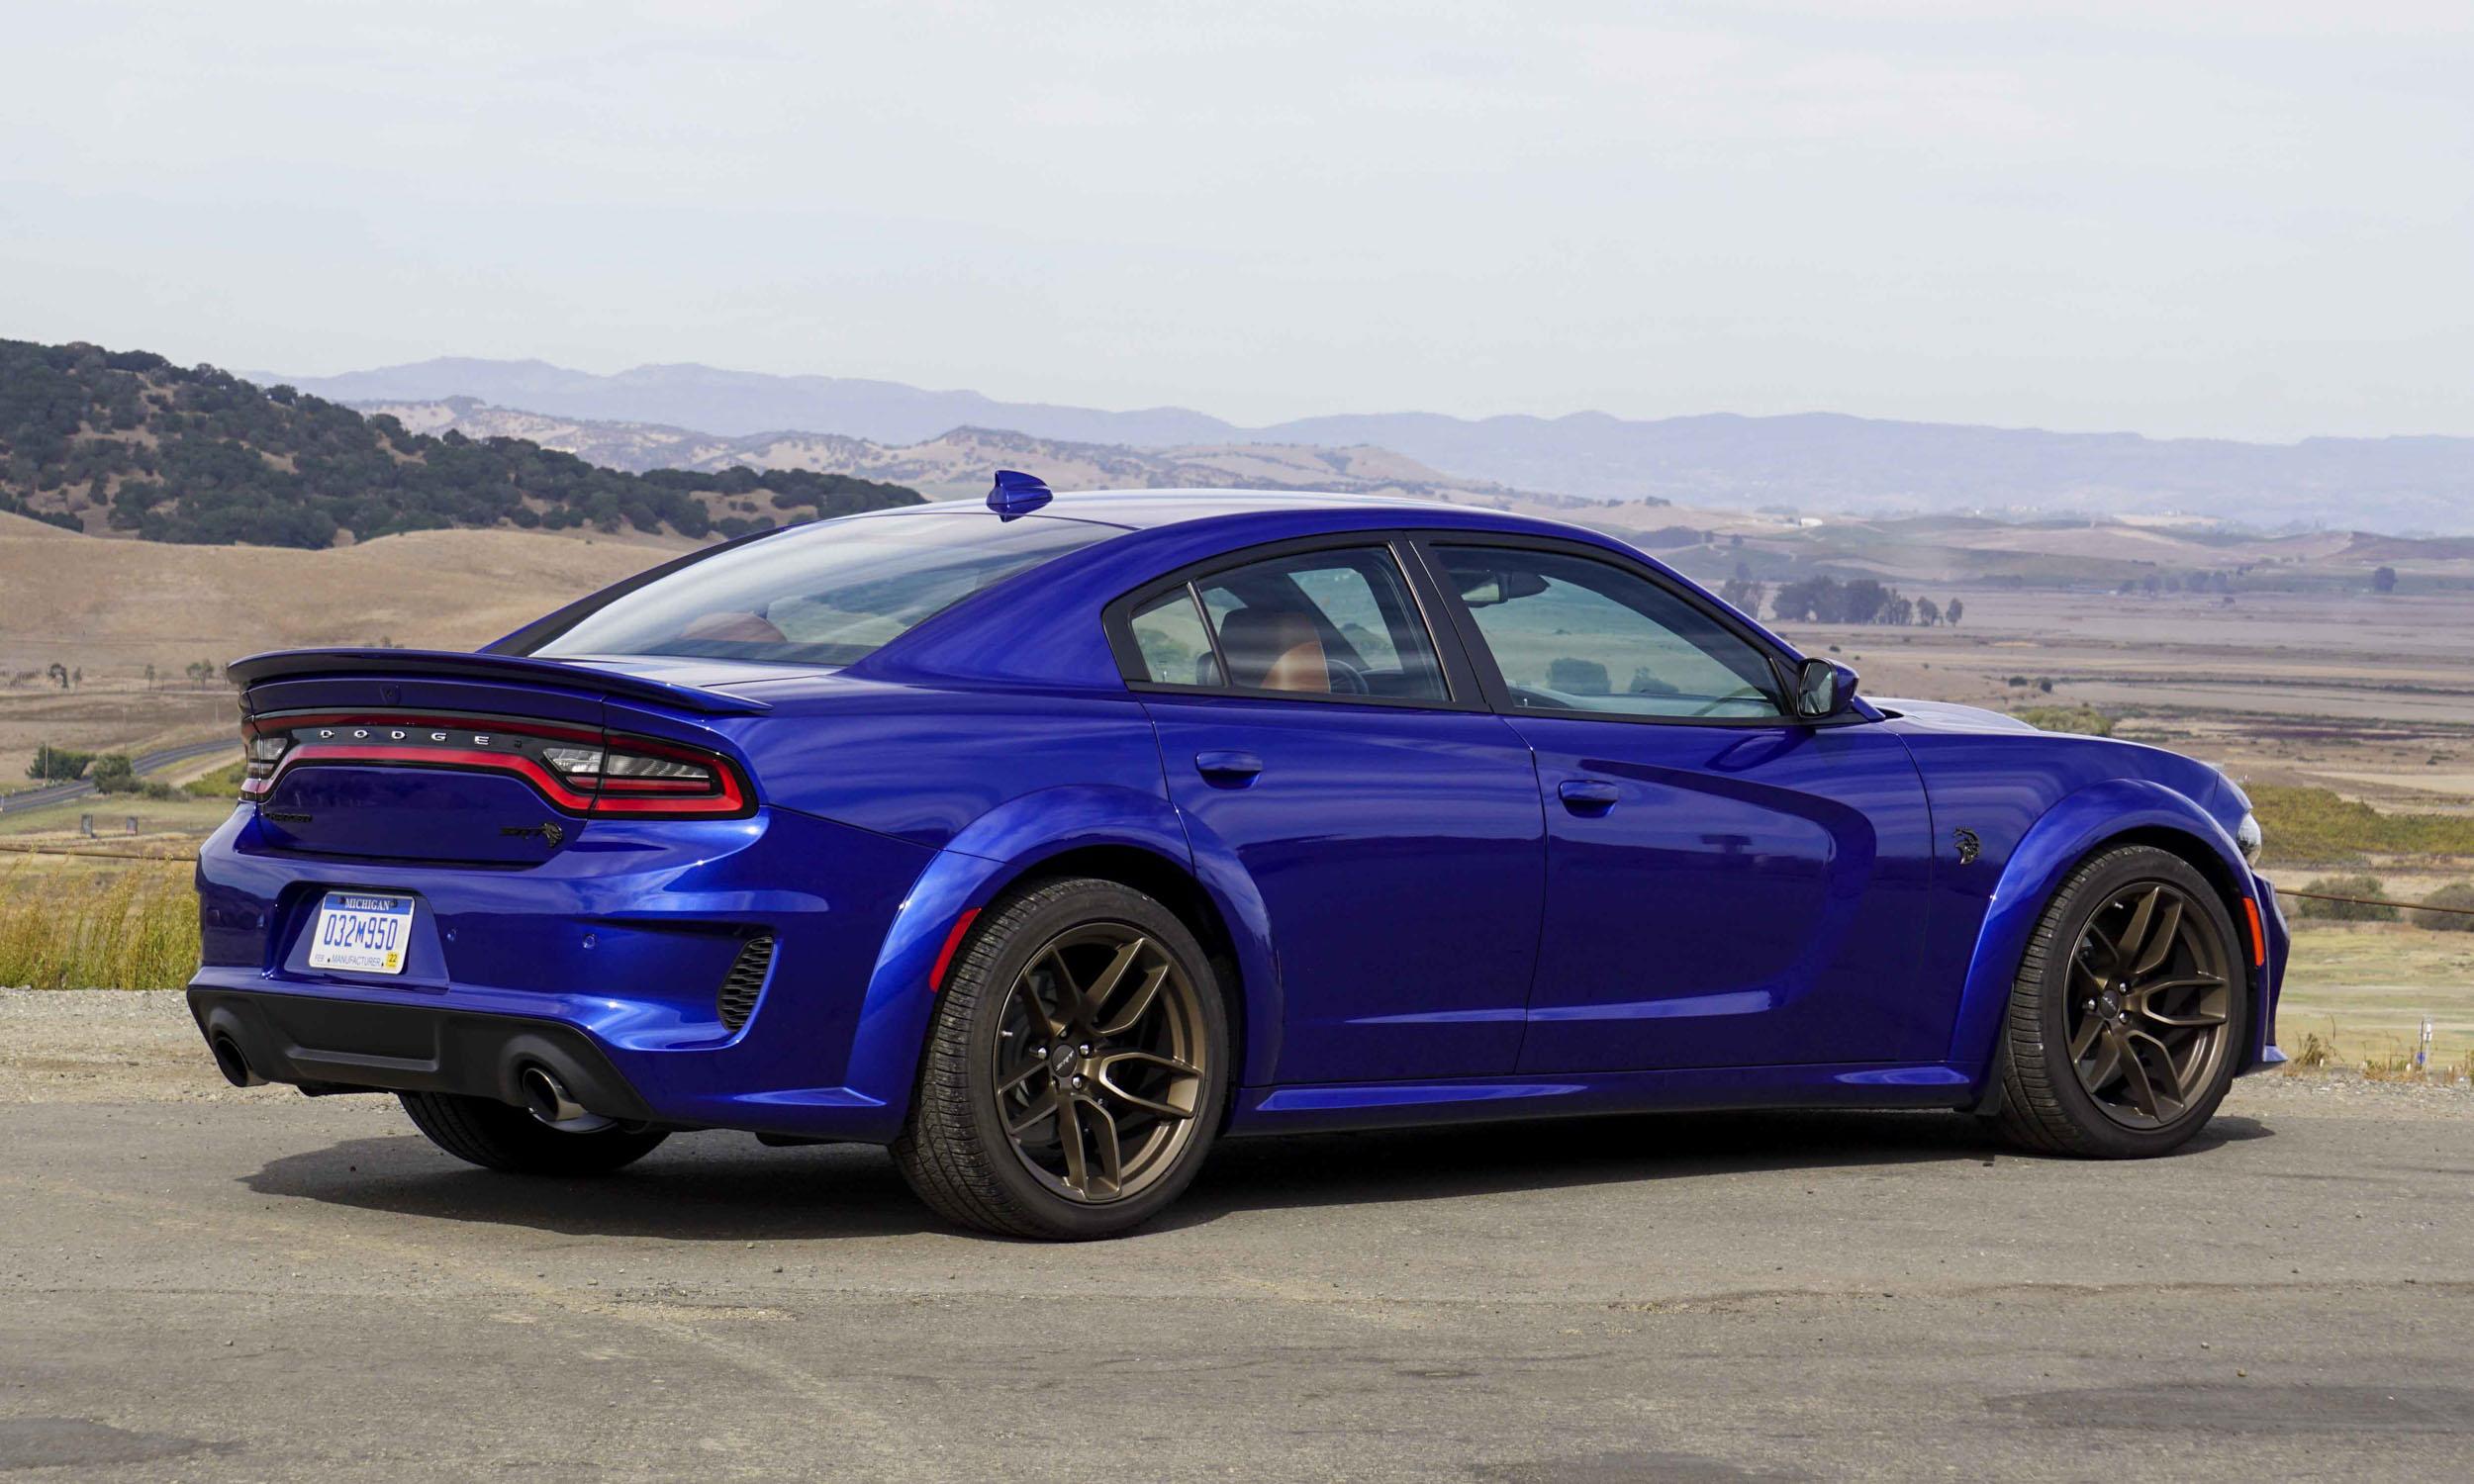 2020 Dodge Charger Srt Hellcat First Drive Review Autonxt